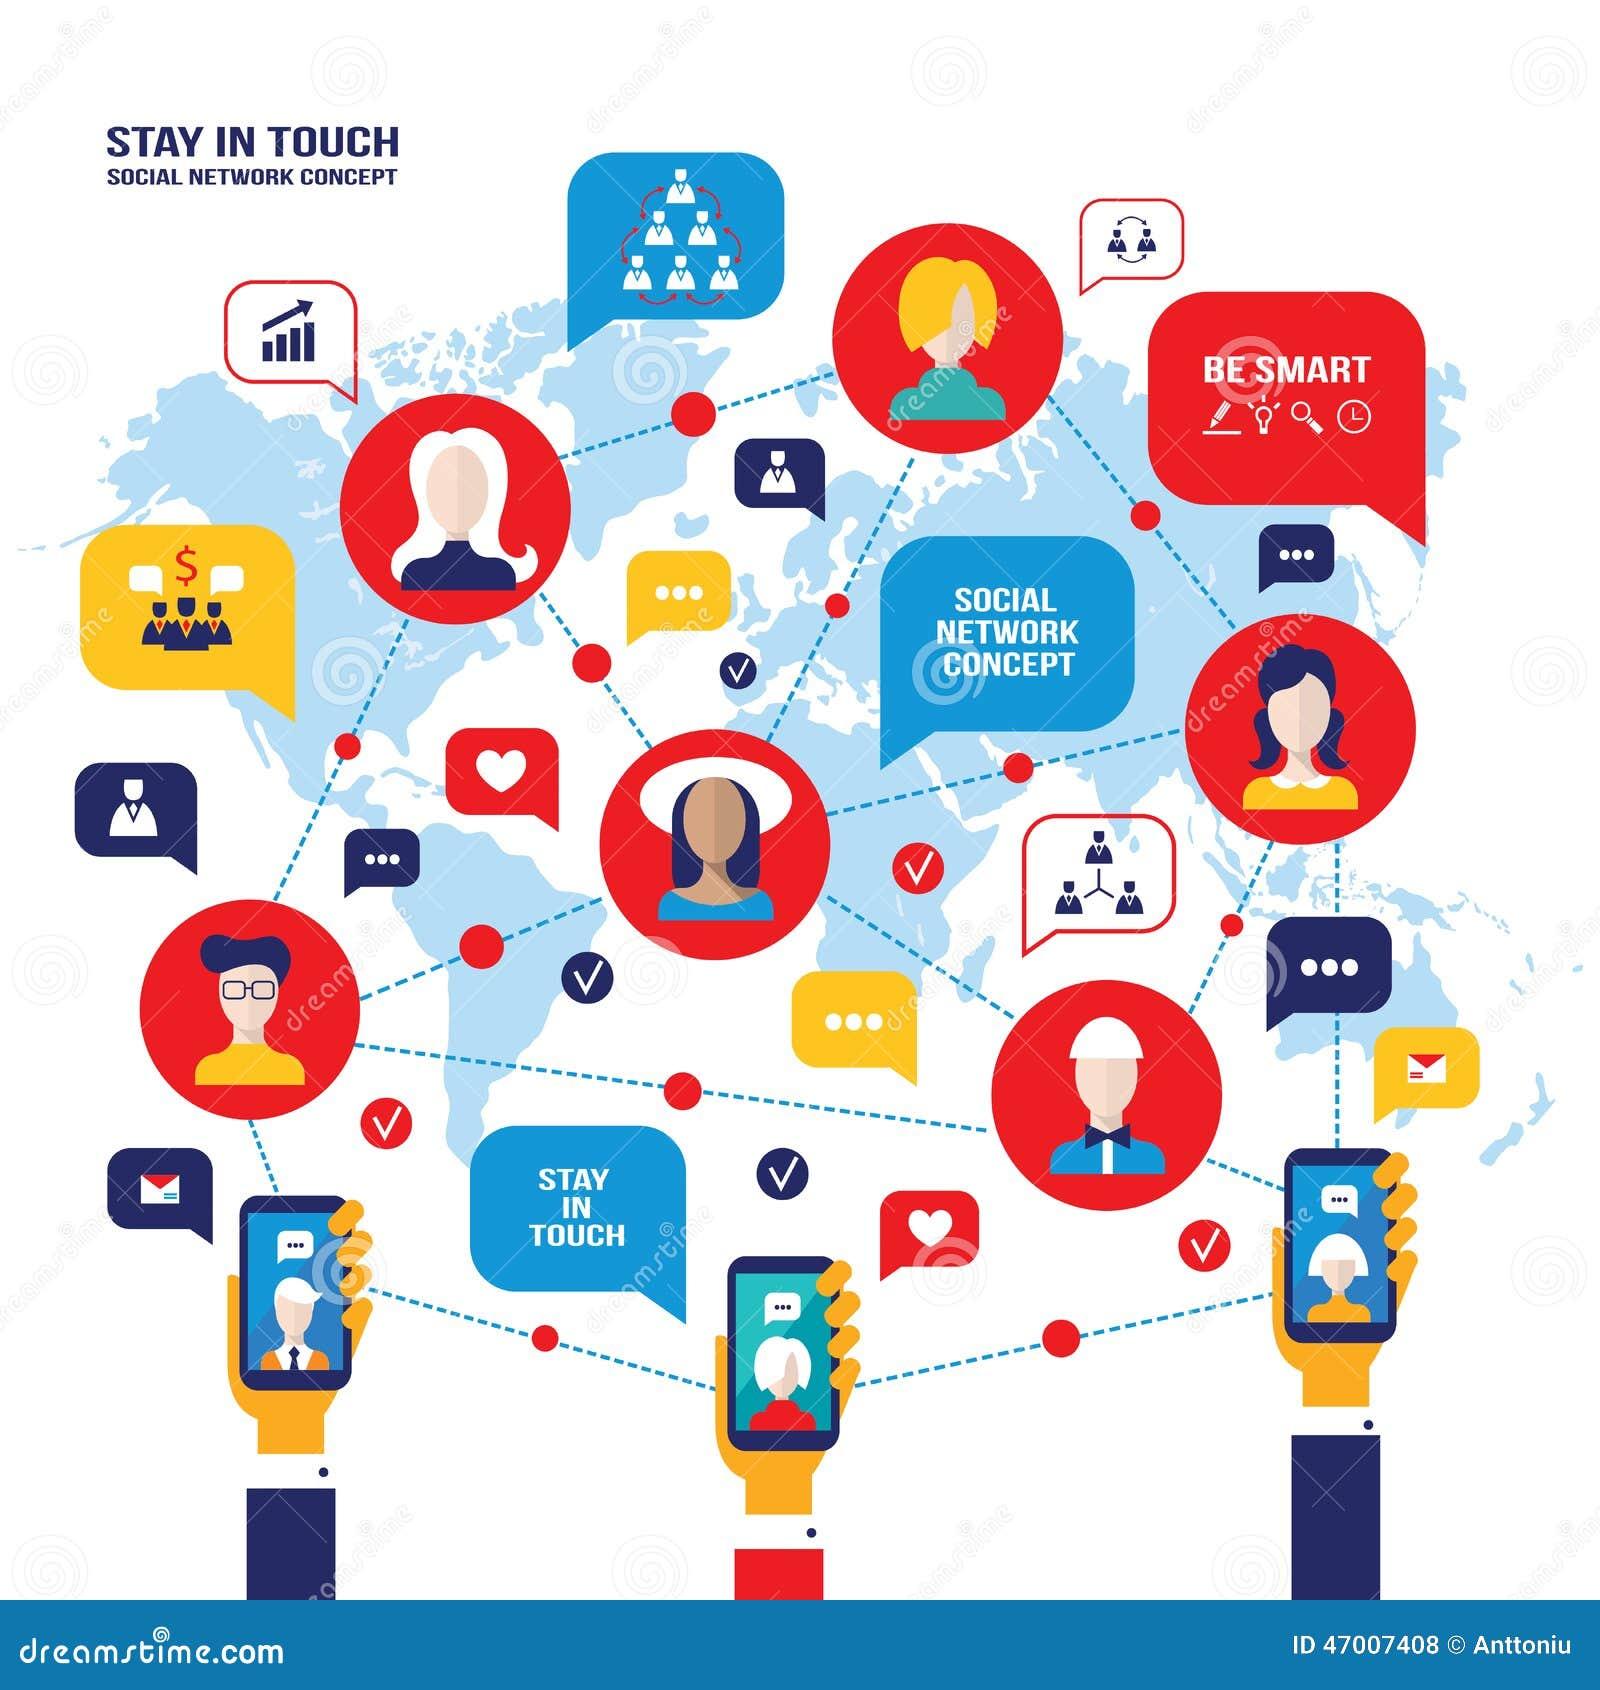 Office Furniture Blogs Social Network Concept People Avatars Mobile Smart Phones